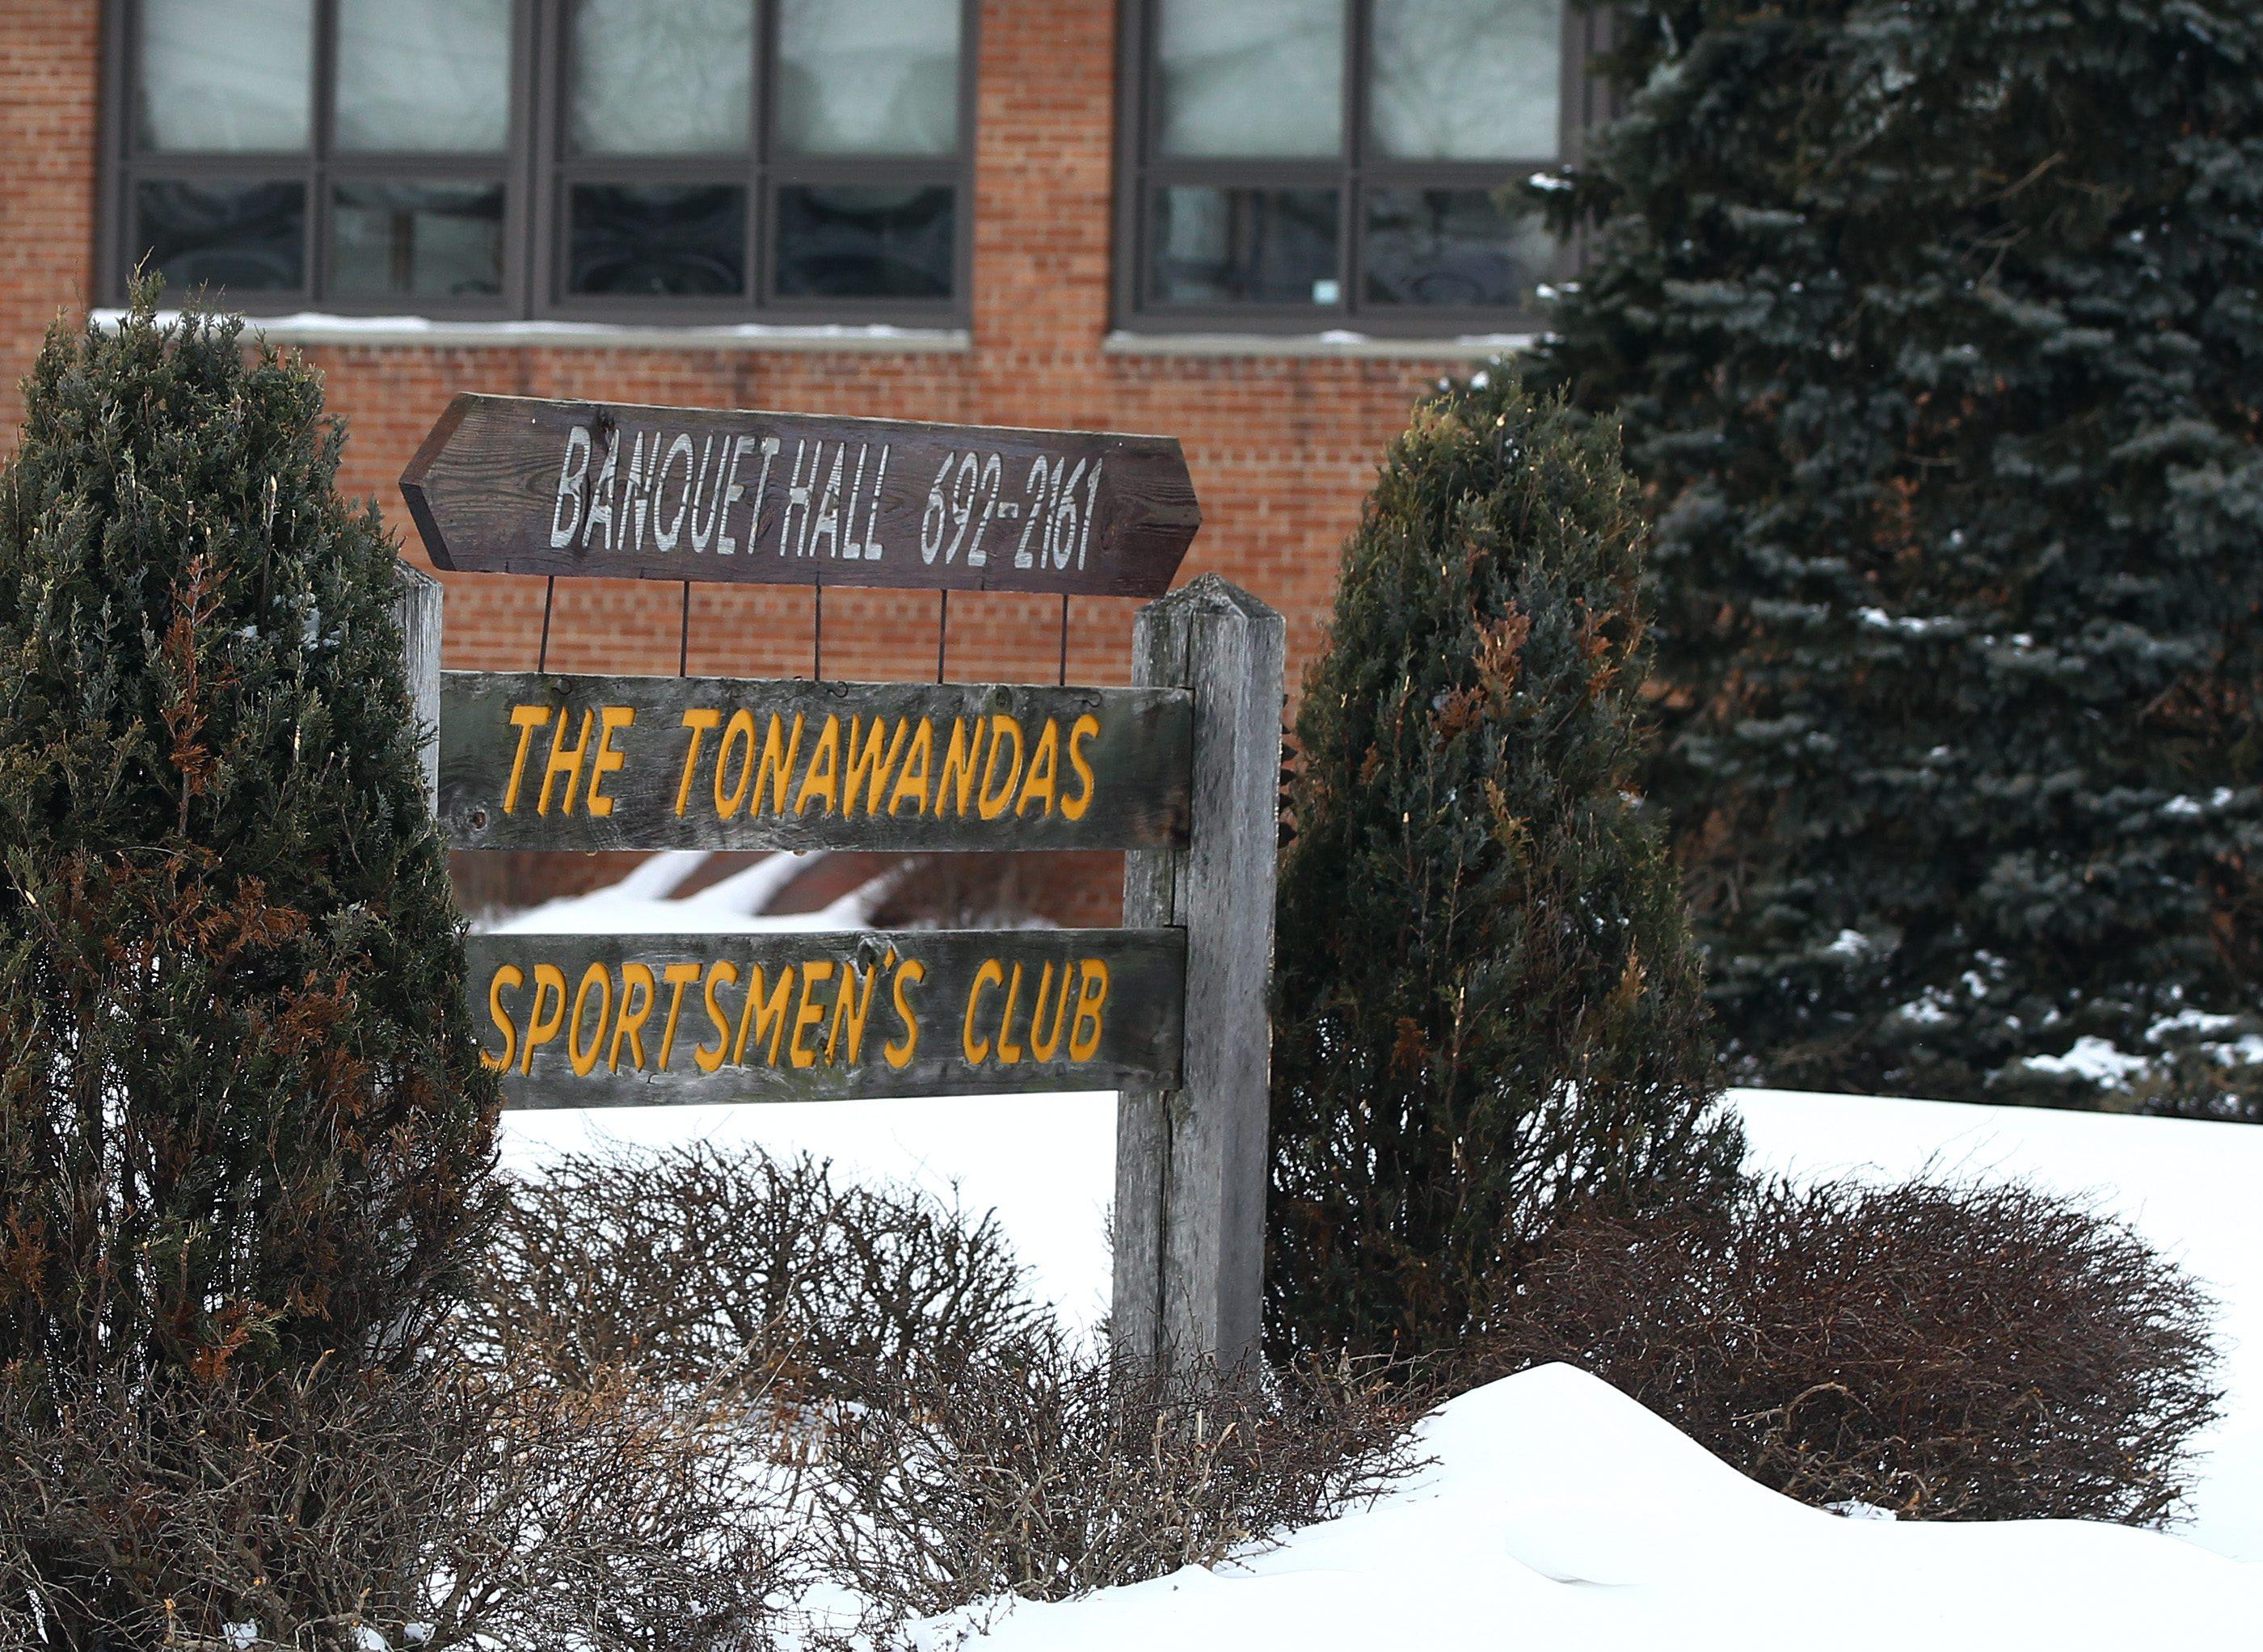 The Tonawandas Sportmen's Club has been in existence since 1943. (James P. McCoy/Buffalo News file photo)